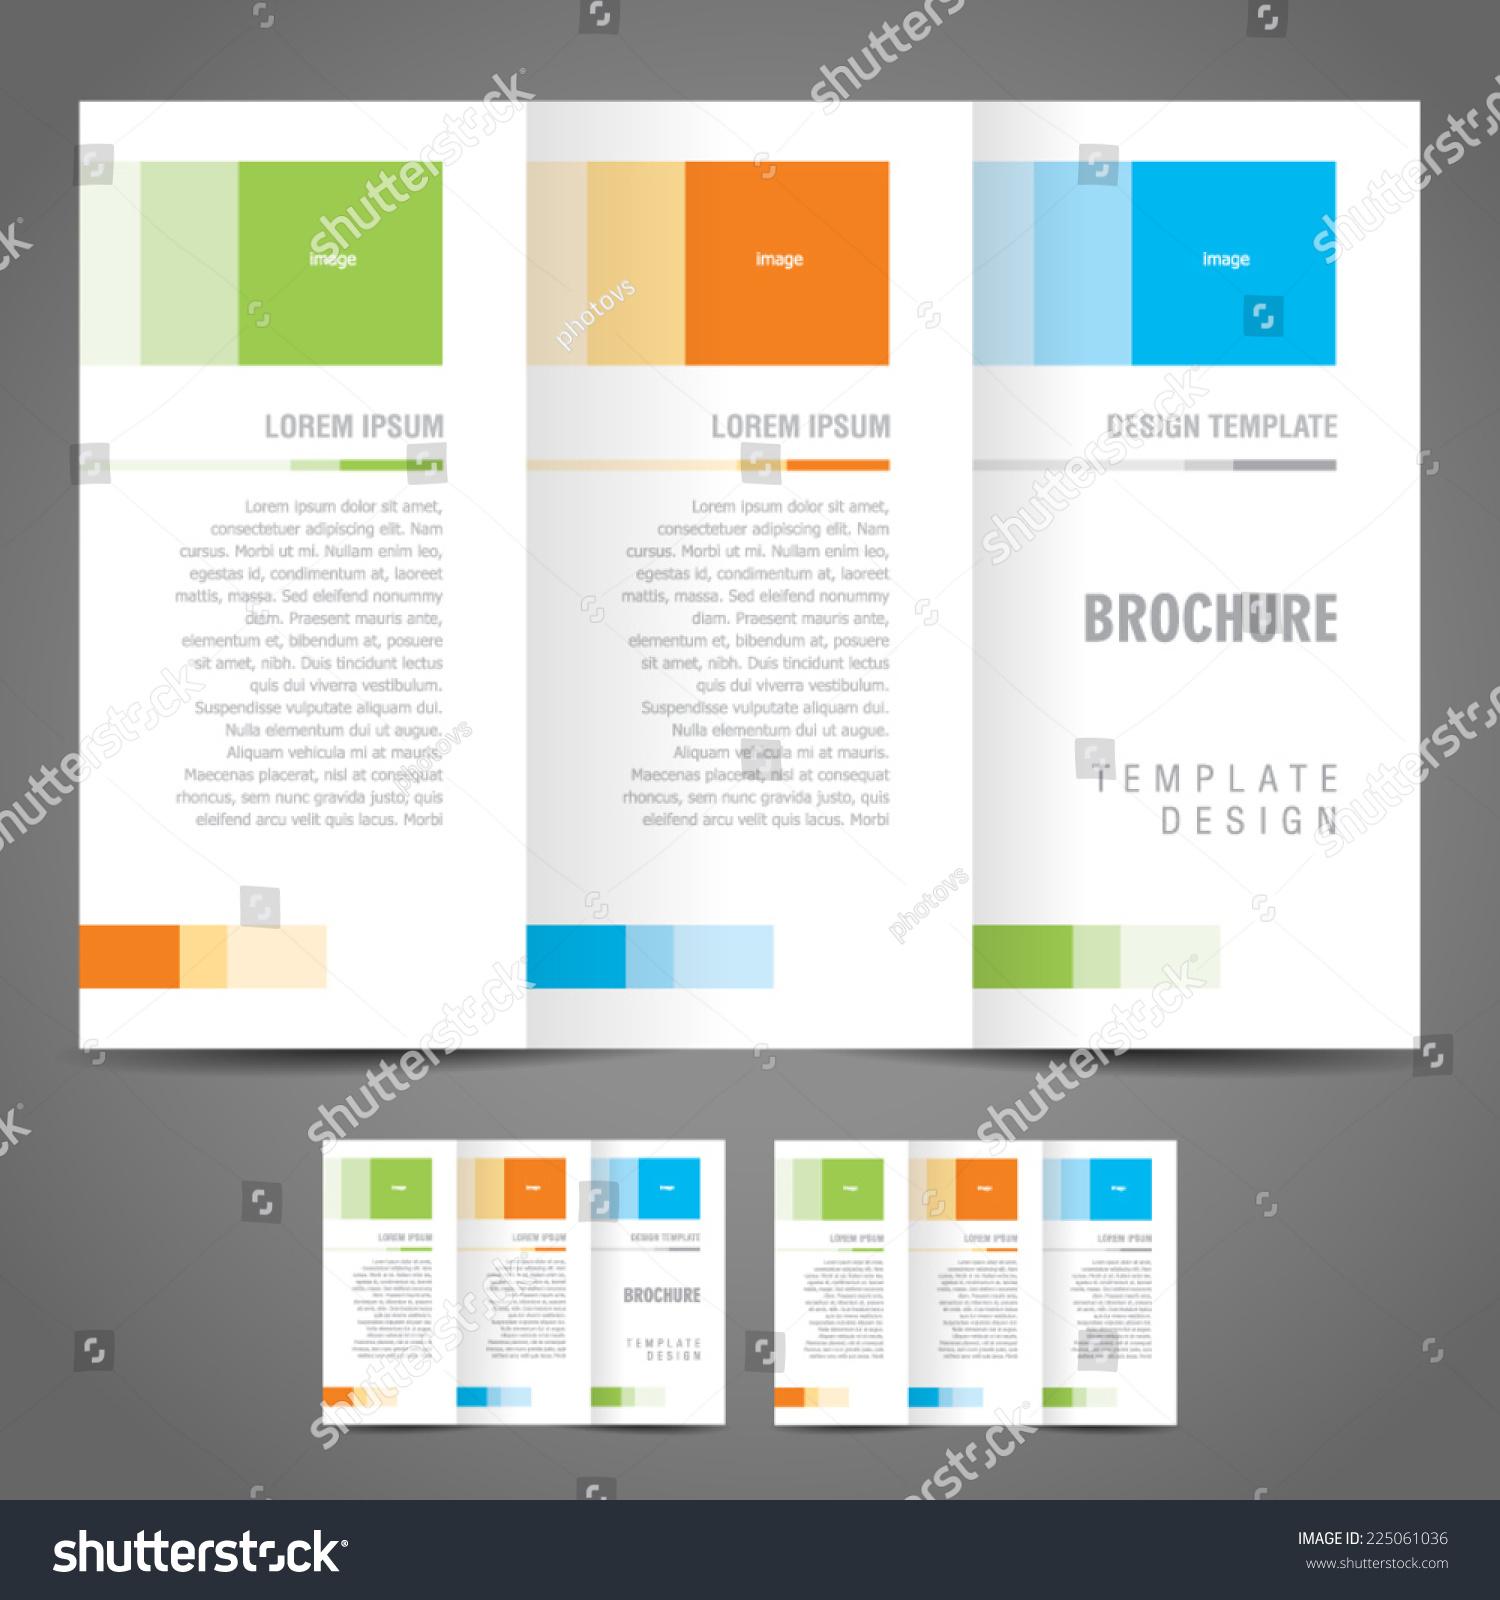 simple brochure design template trifold 225061036